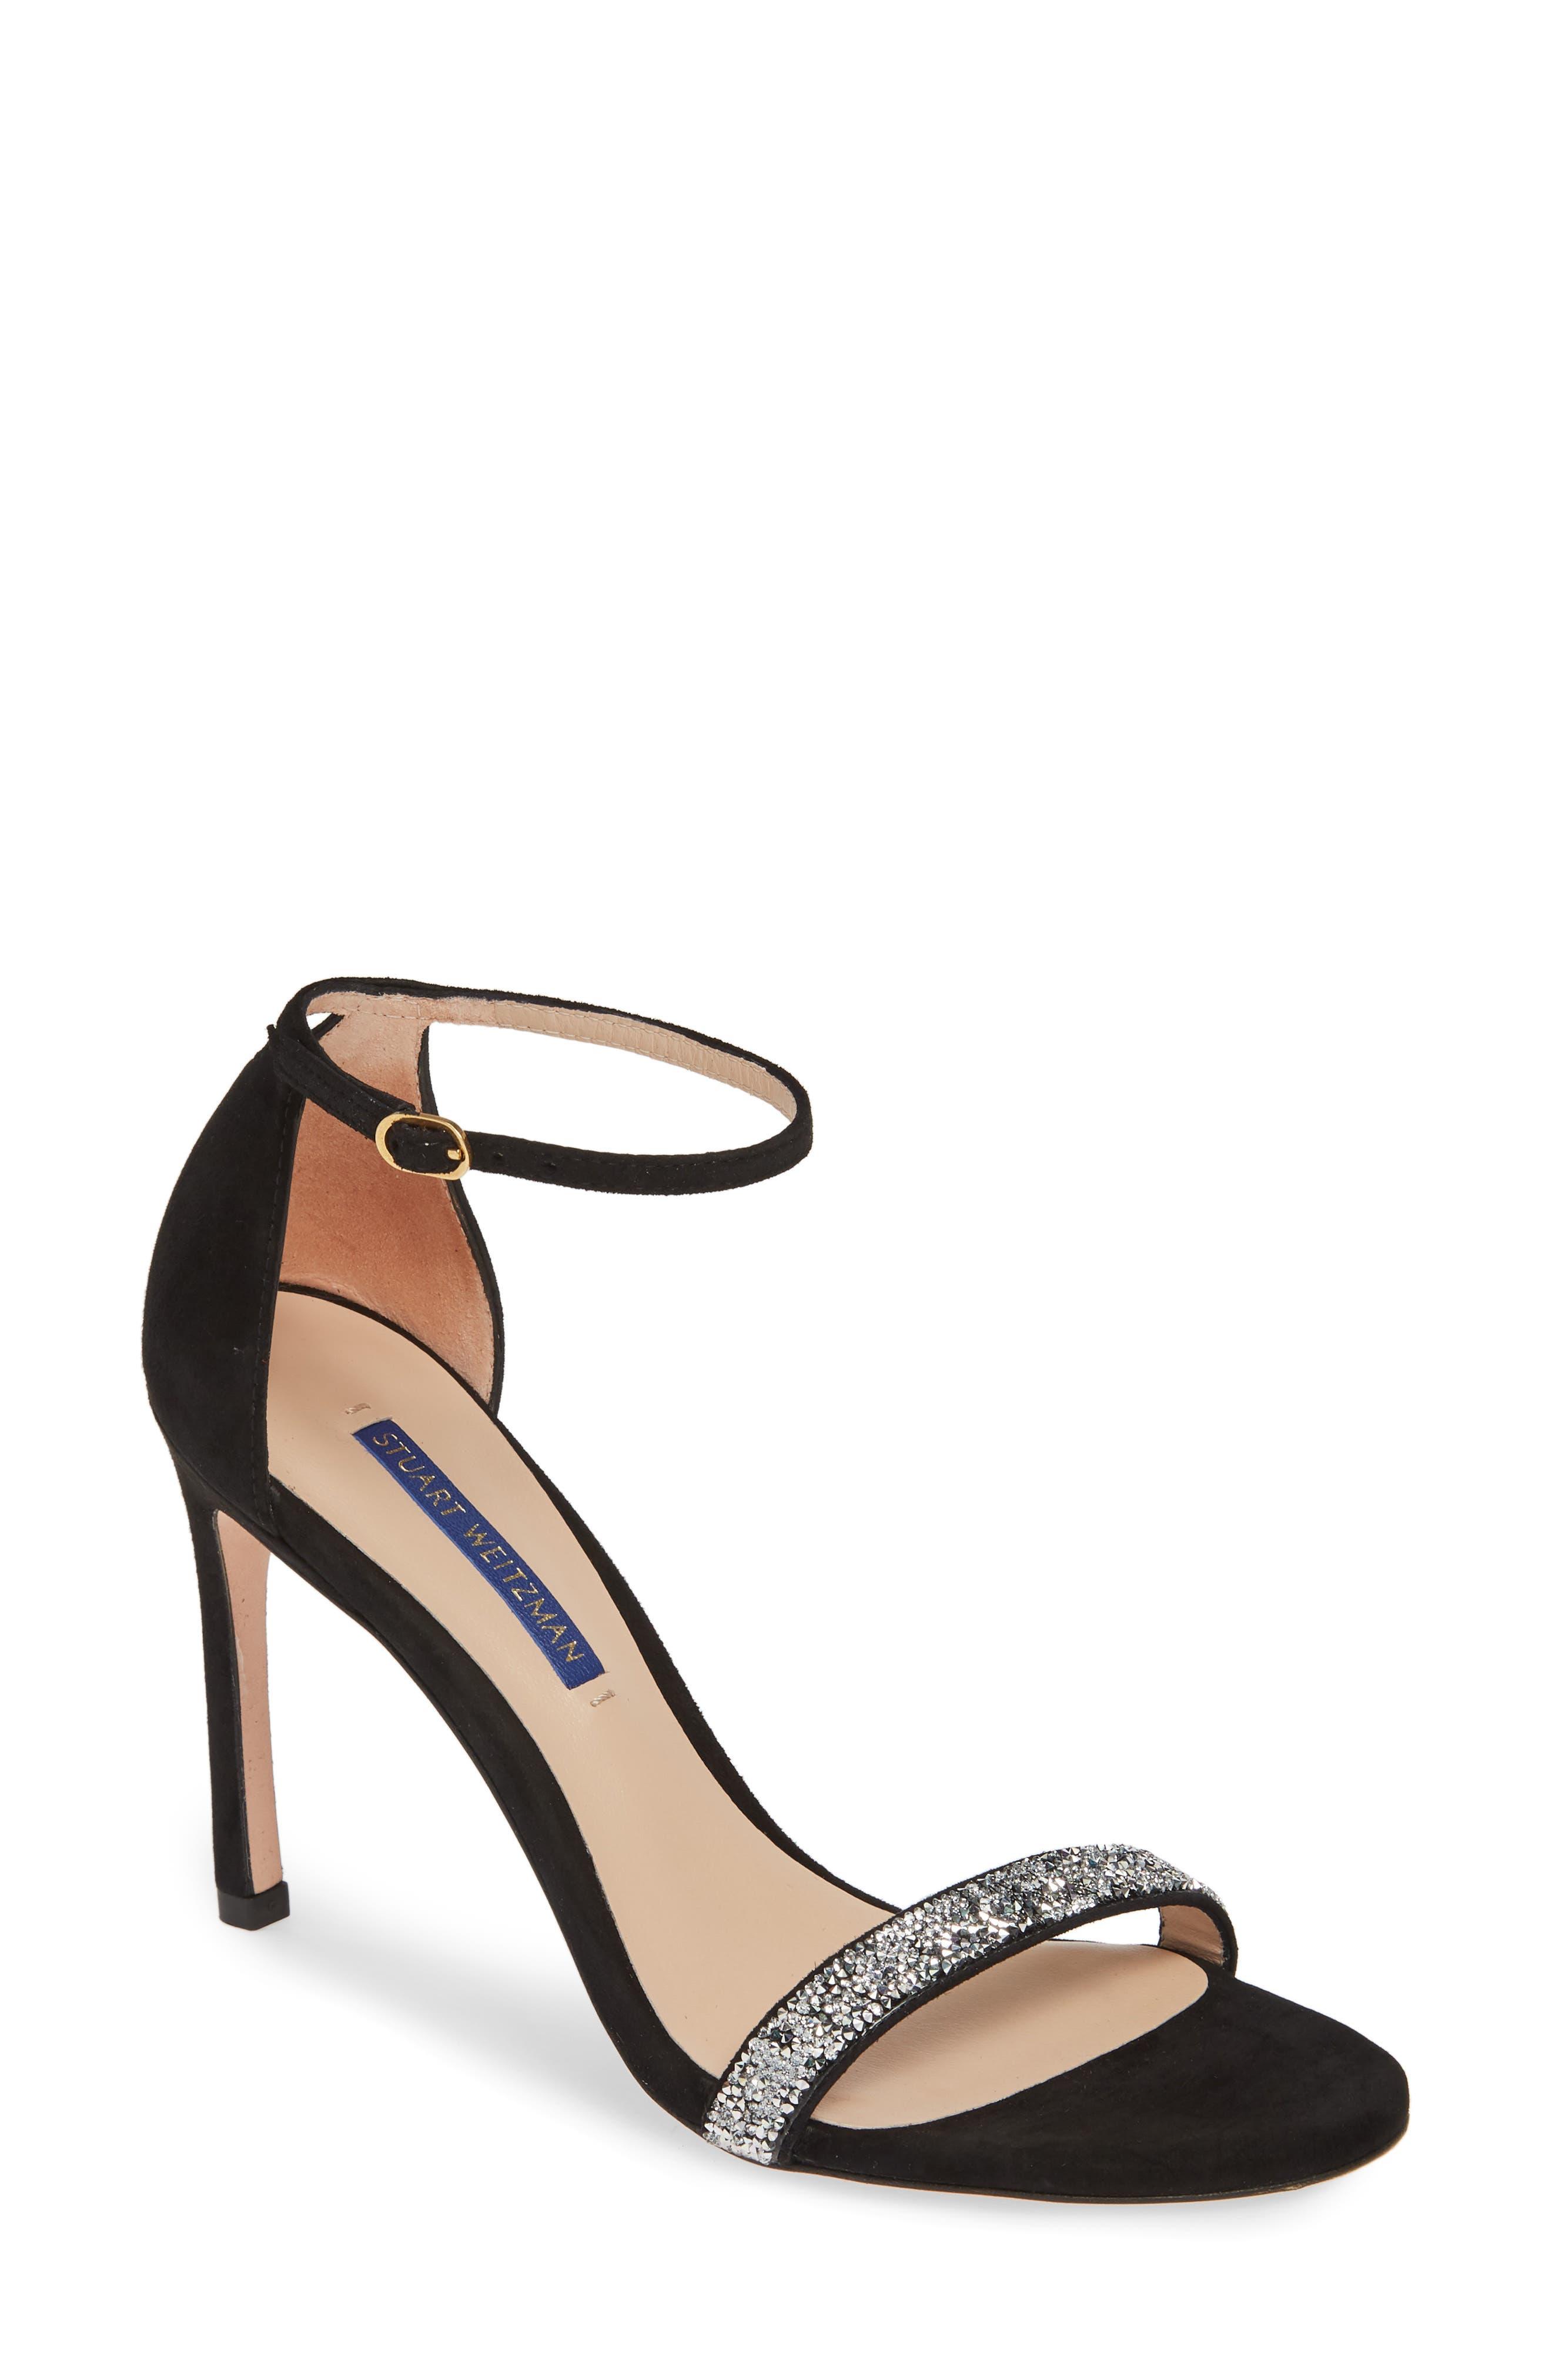 STUART WEITZMAN Nudistsong Ankle Strap Sandal, Main, color, BLACK